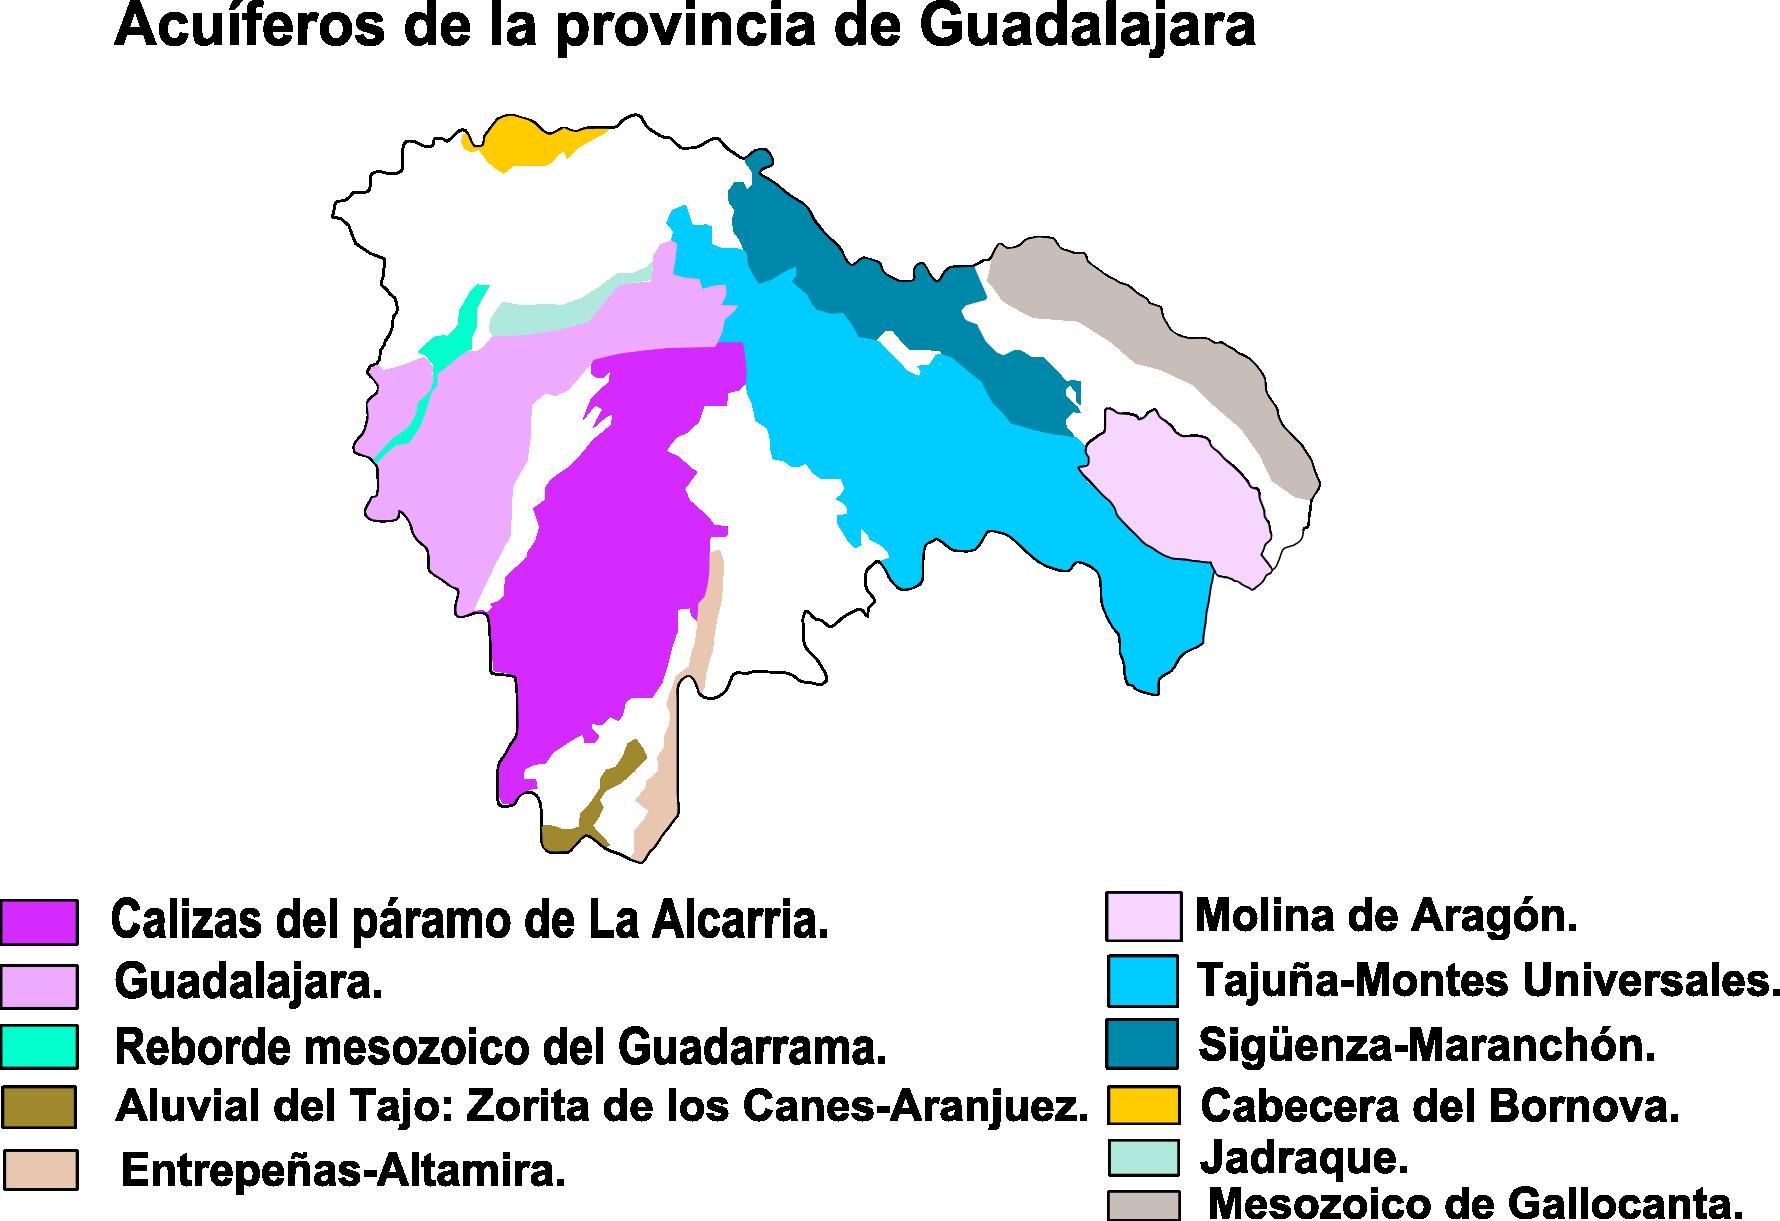 Aquifers in the Province of Guadalajara 2008